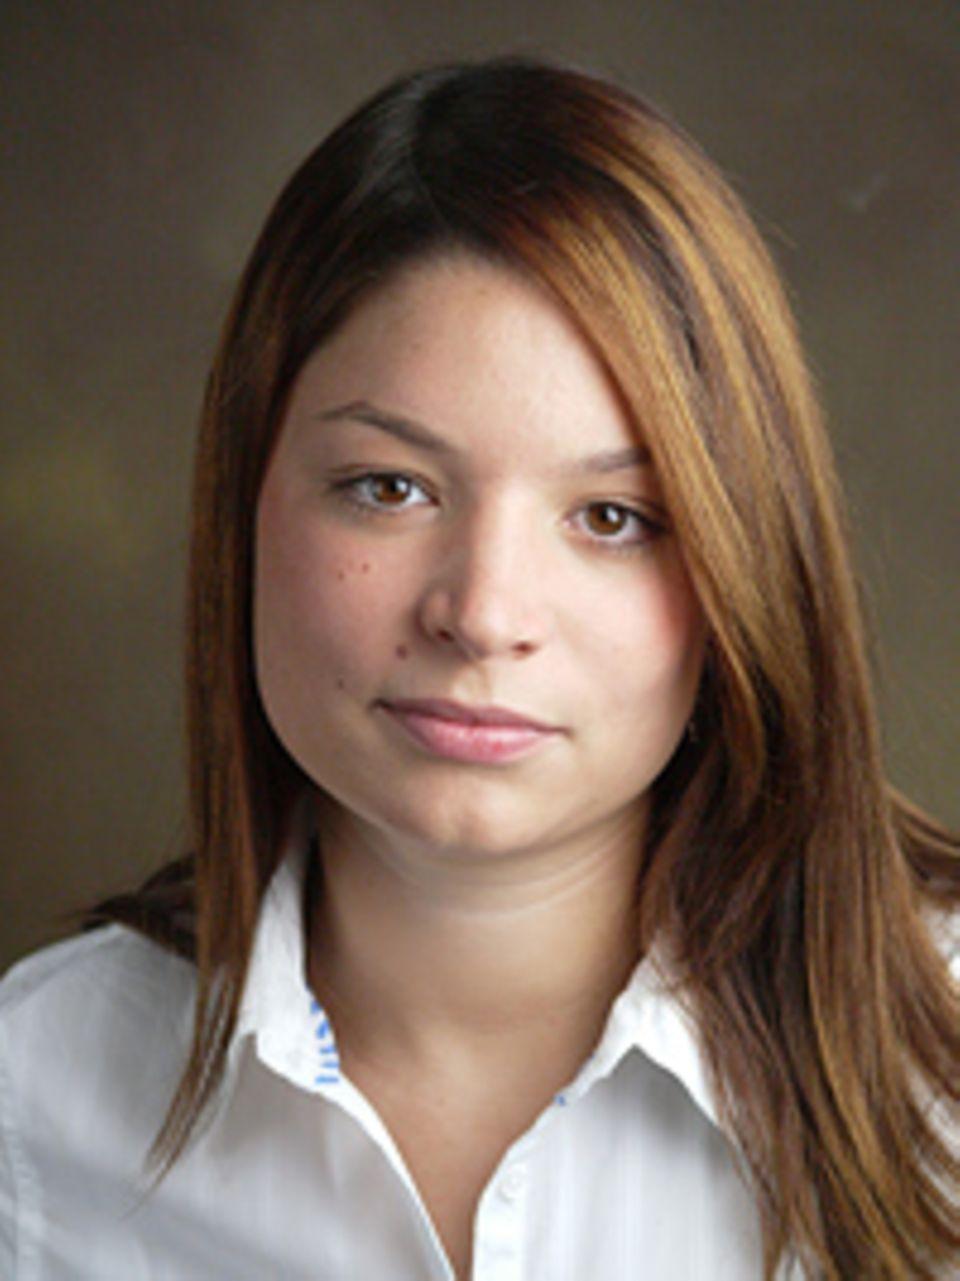 Studieren mit Stipendium: Svenja Damzog